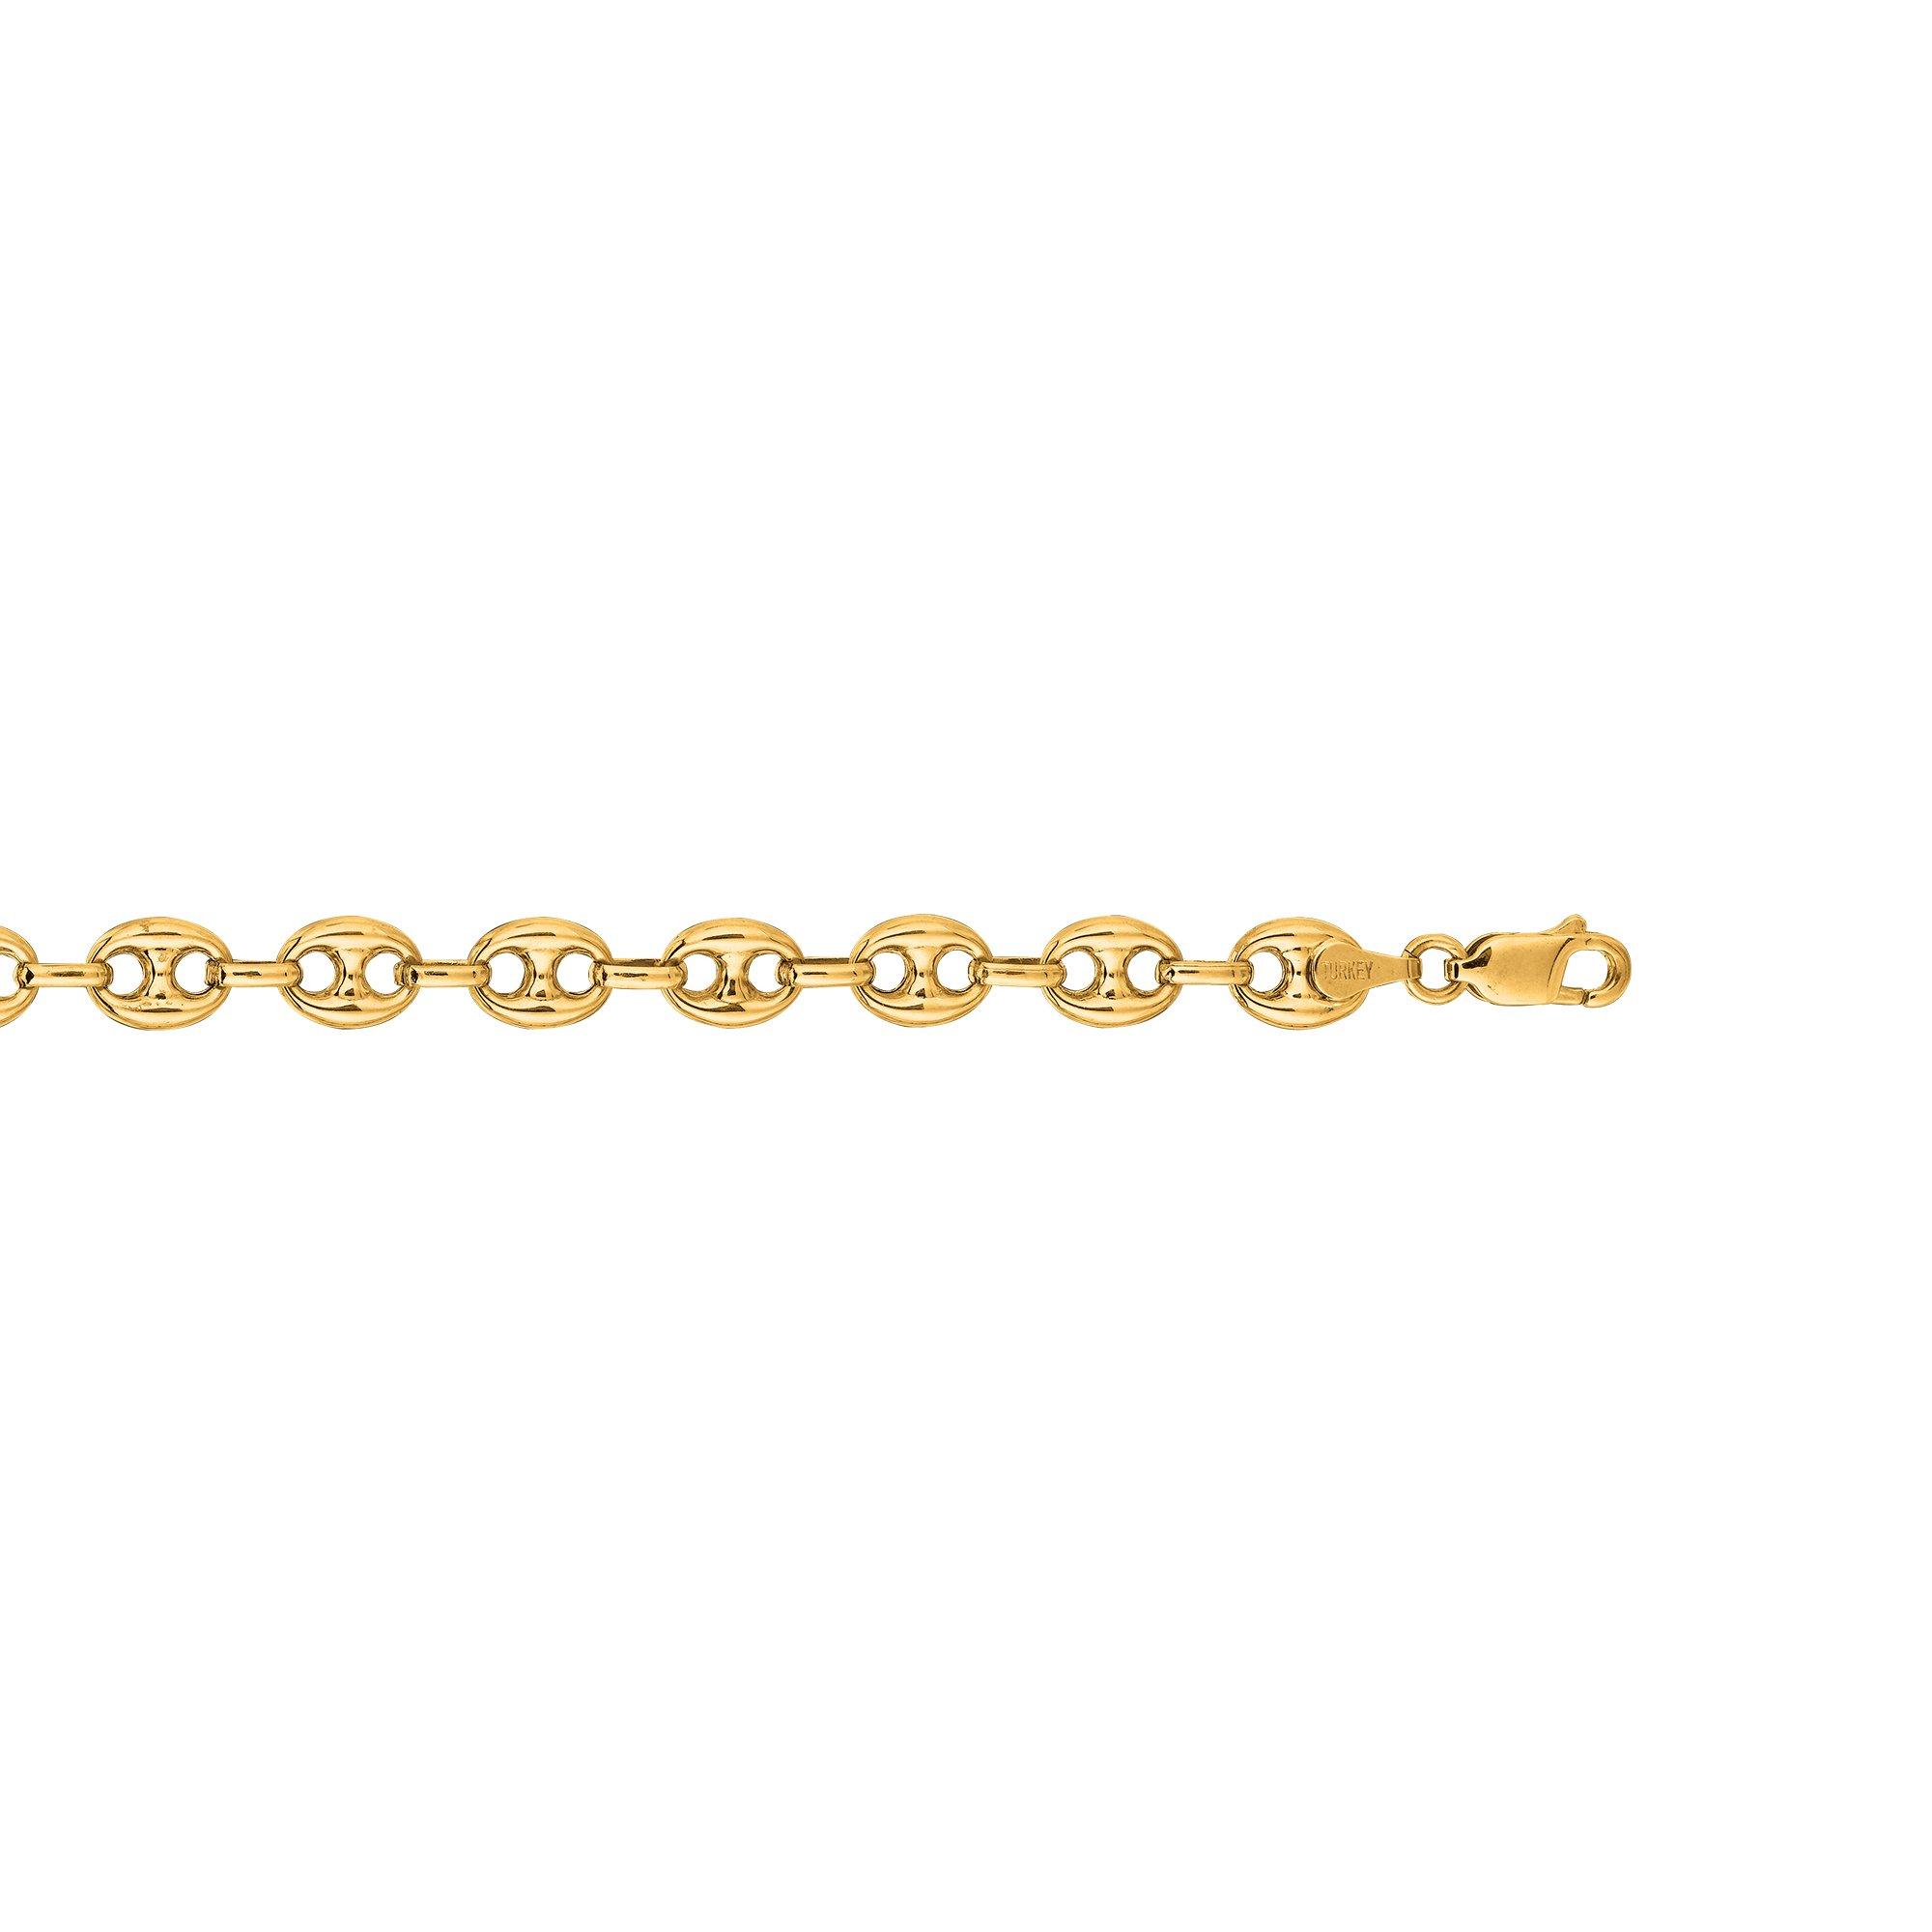 IcedTime 14K Yellow Gold 7mm Diamond Cut Puffed Mariner Link Chain 7'' Bracelet Fancy Lobster Clasp